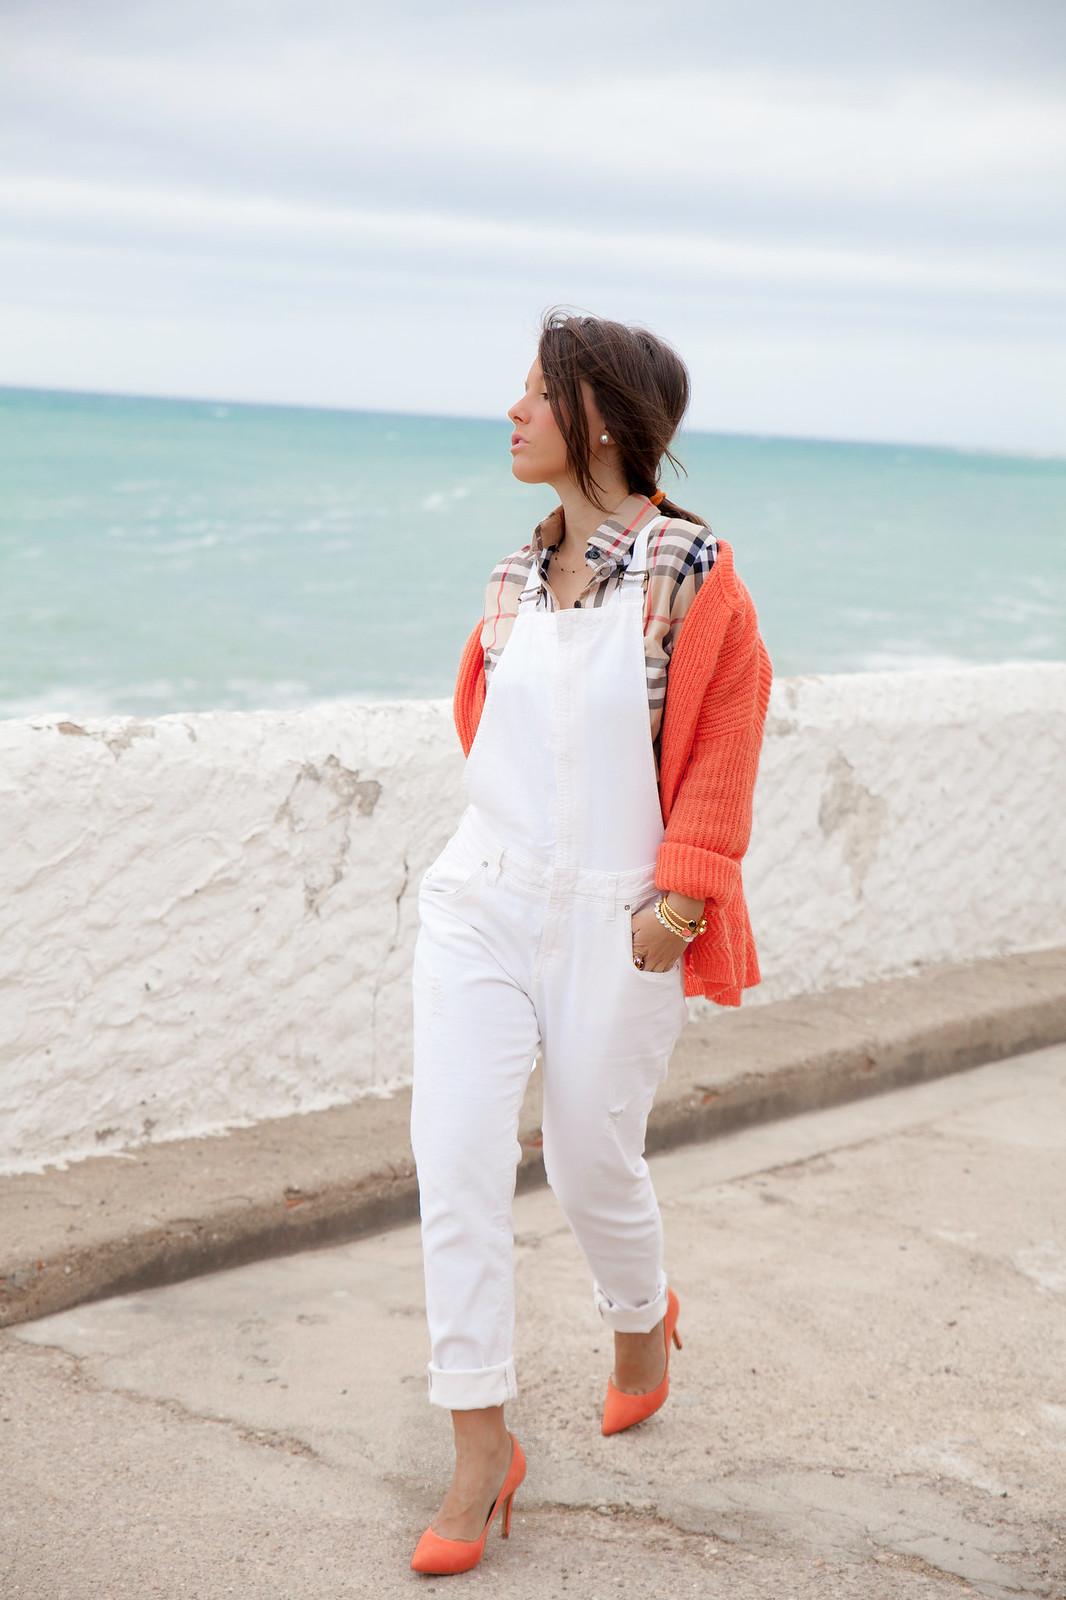 08_Burberry_Outfit_White_overall_Combinar_peto_con_tacones_mas34_theguestgirl_influencer_barcelona